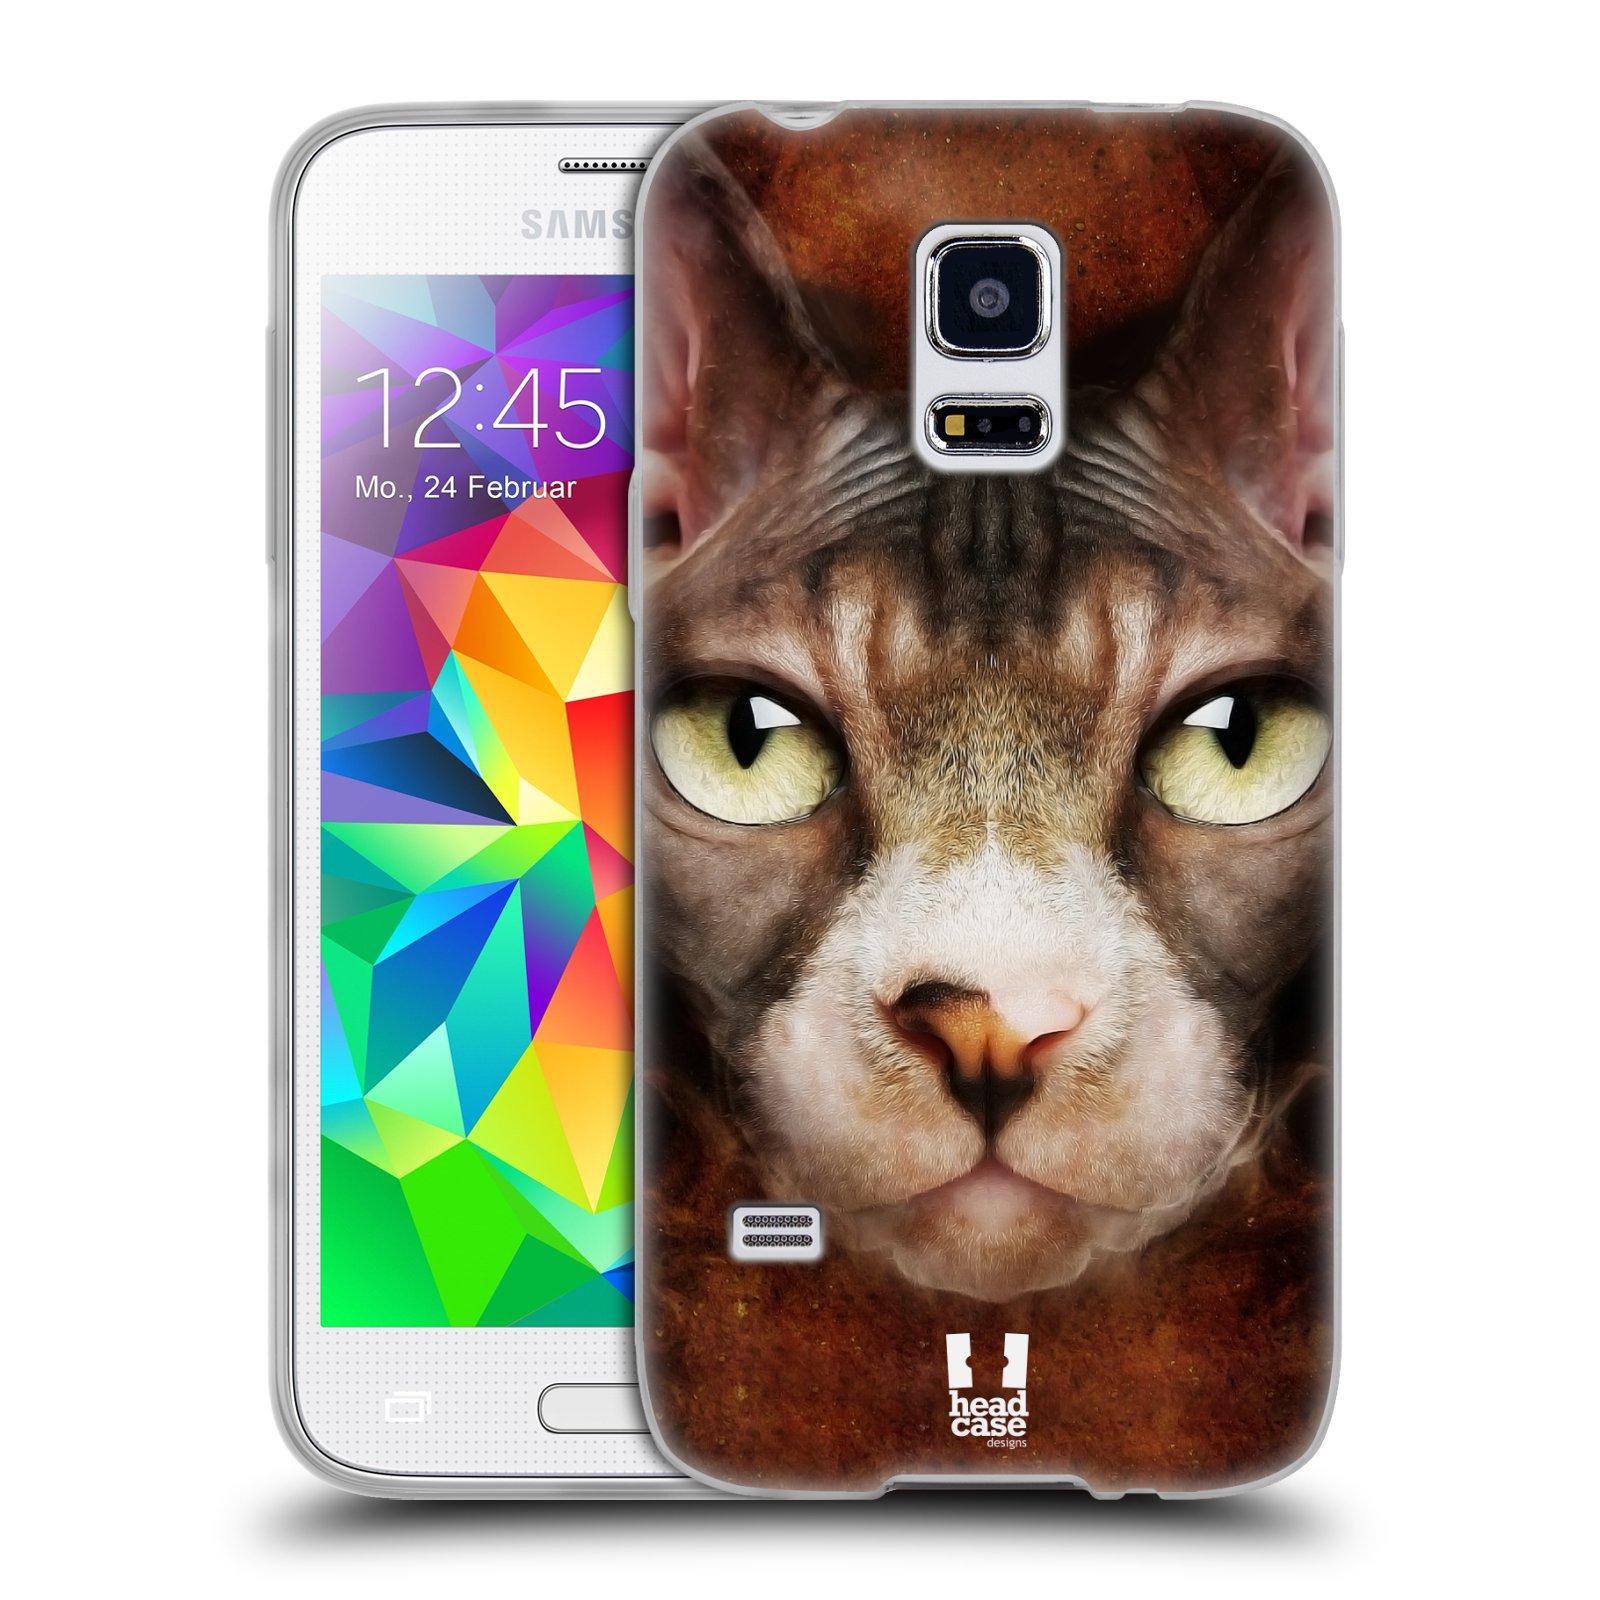 HEAD CASE silikonový obal na mobil Samsung Galaxy S5 MINI vzor Zvířecí tváře kočka sphynx